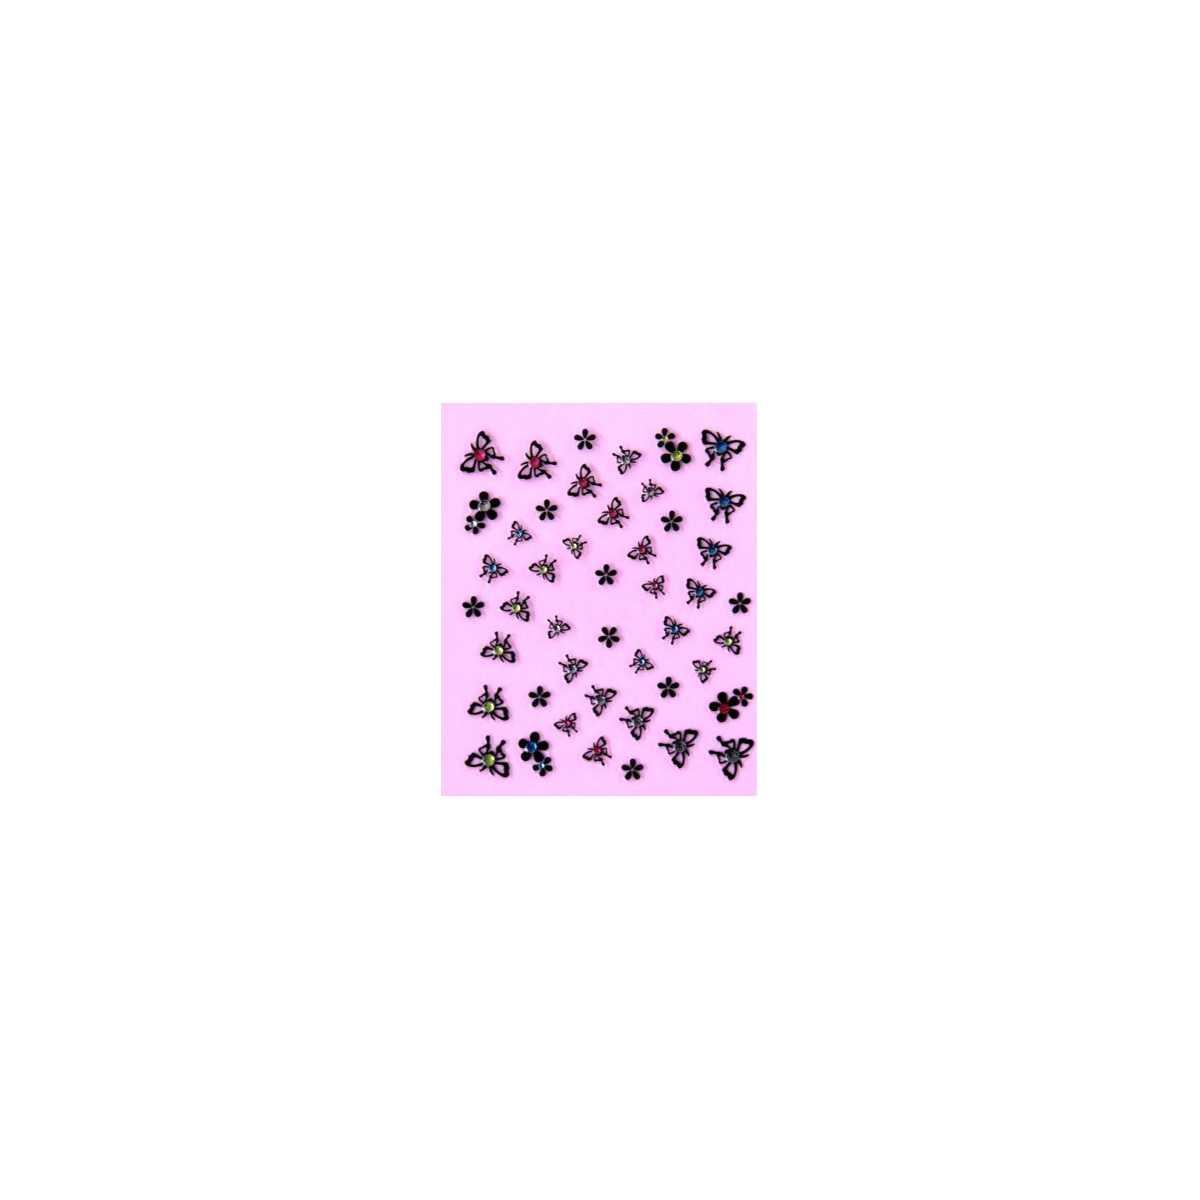 https://www.kit-manucure.com/790-thickbox_default/stickers-papillons-et-fleurs-à-strass.jpg